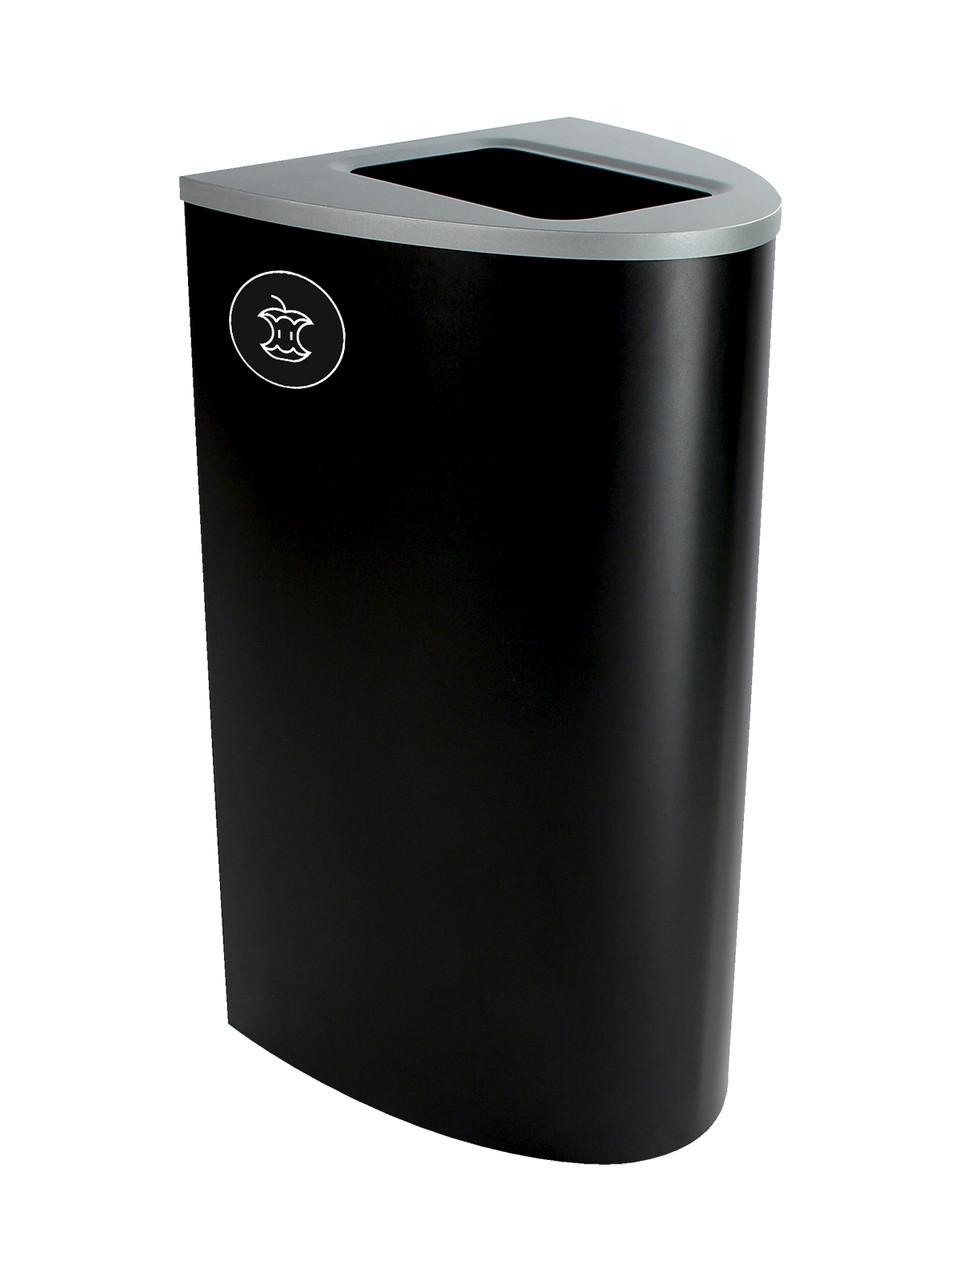 22 Gallon Steel Spectrum Ellipse Compost Bin Black 8107014-4